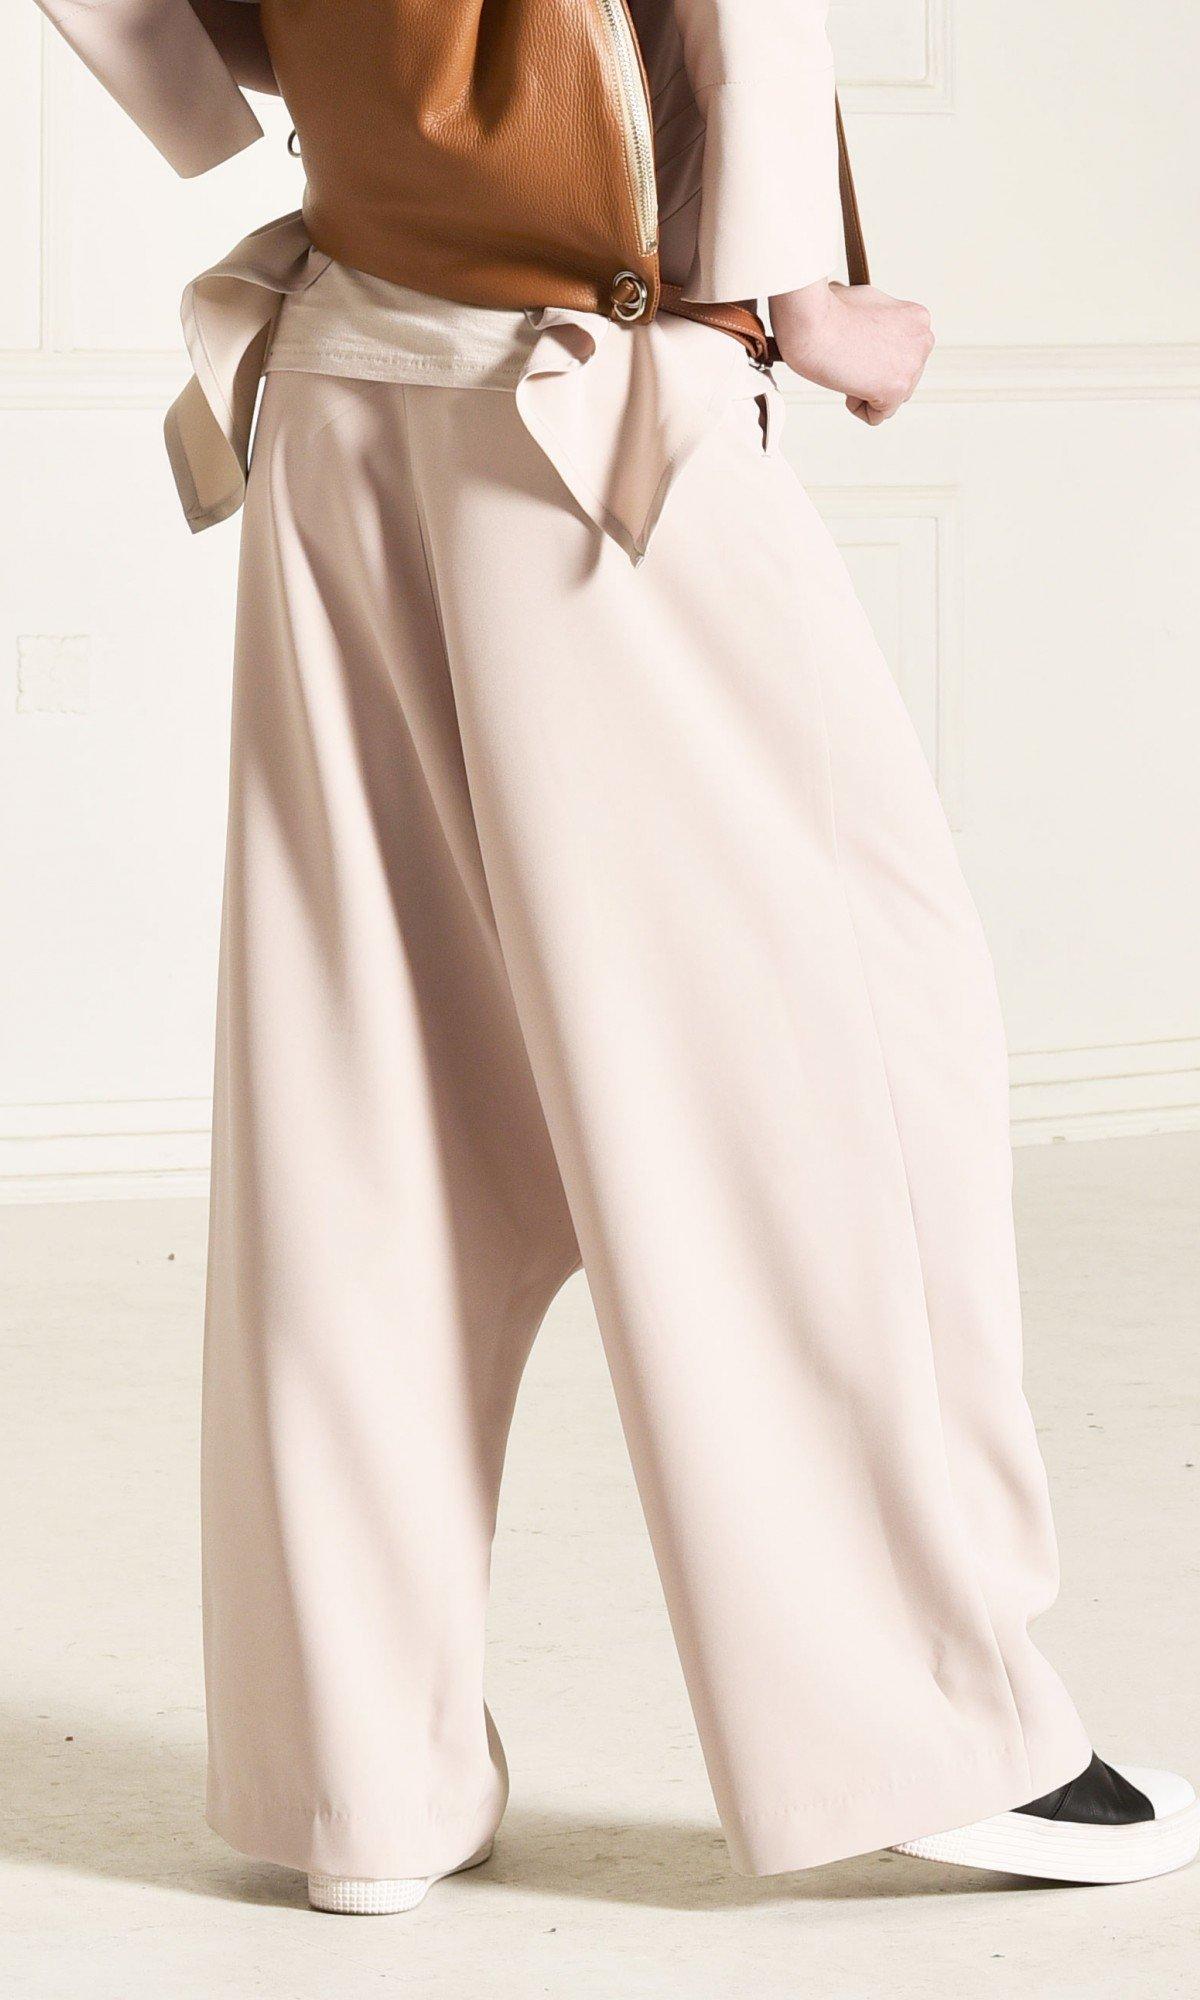 Deep Drop Crotch Polyviscose Pants A90221